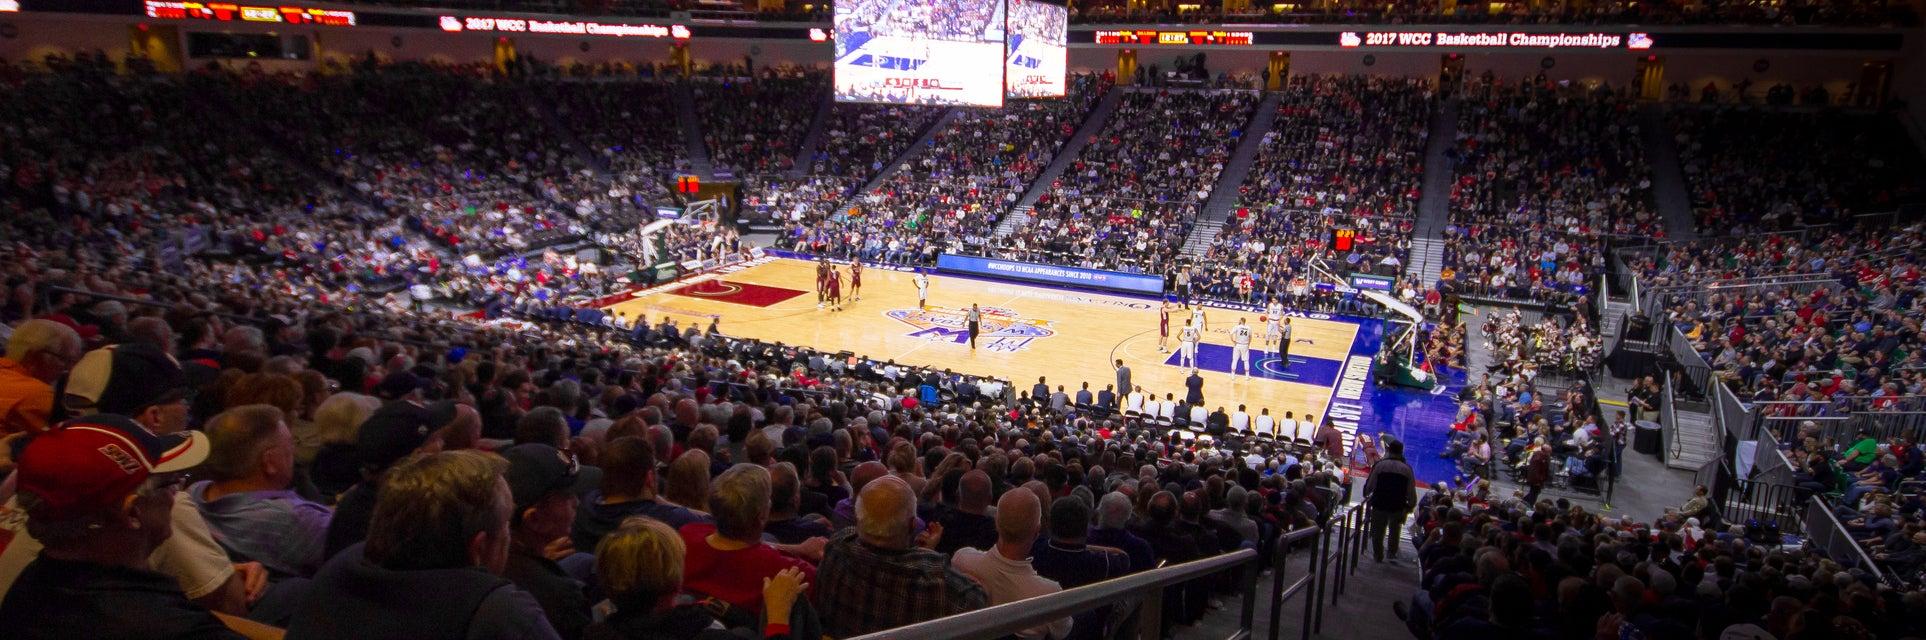 WCC Basketball Tournament Tickets